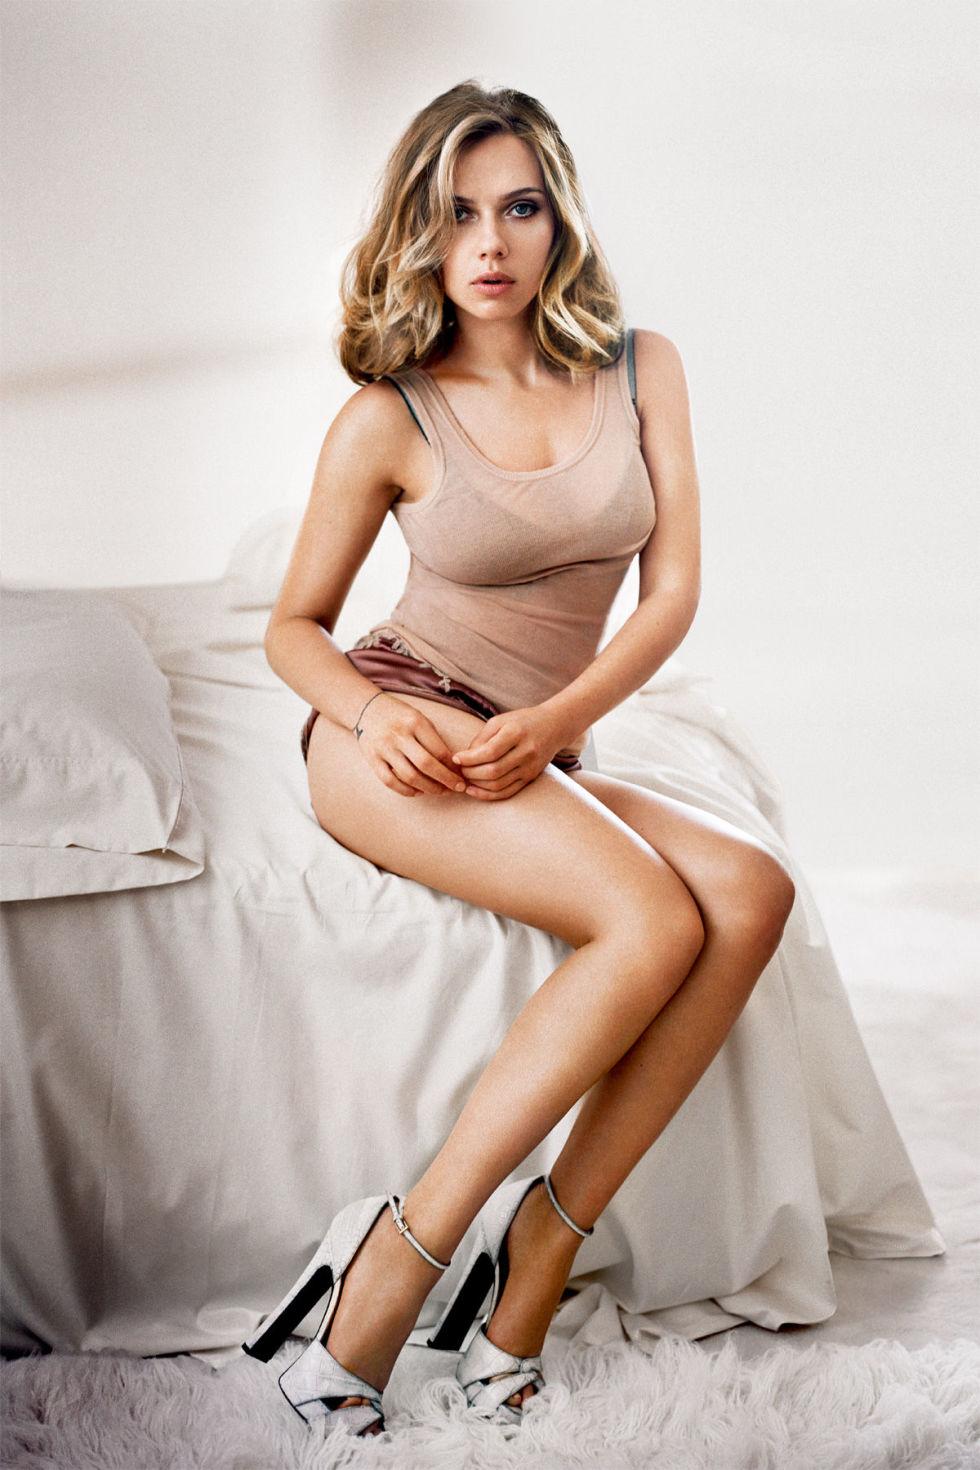 Scarlett Johansson | Famous Celebrity Bible